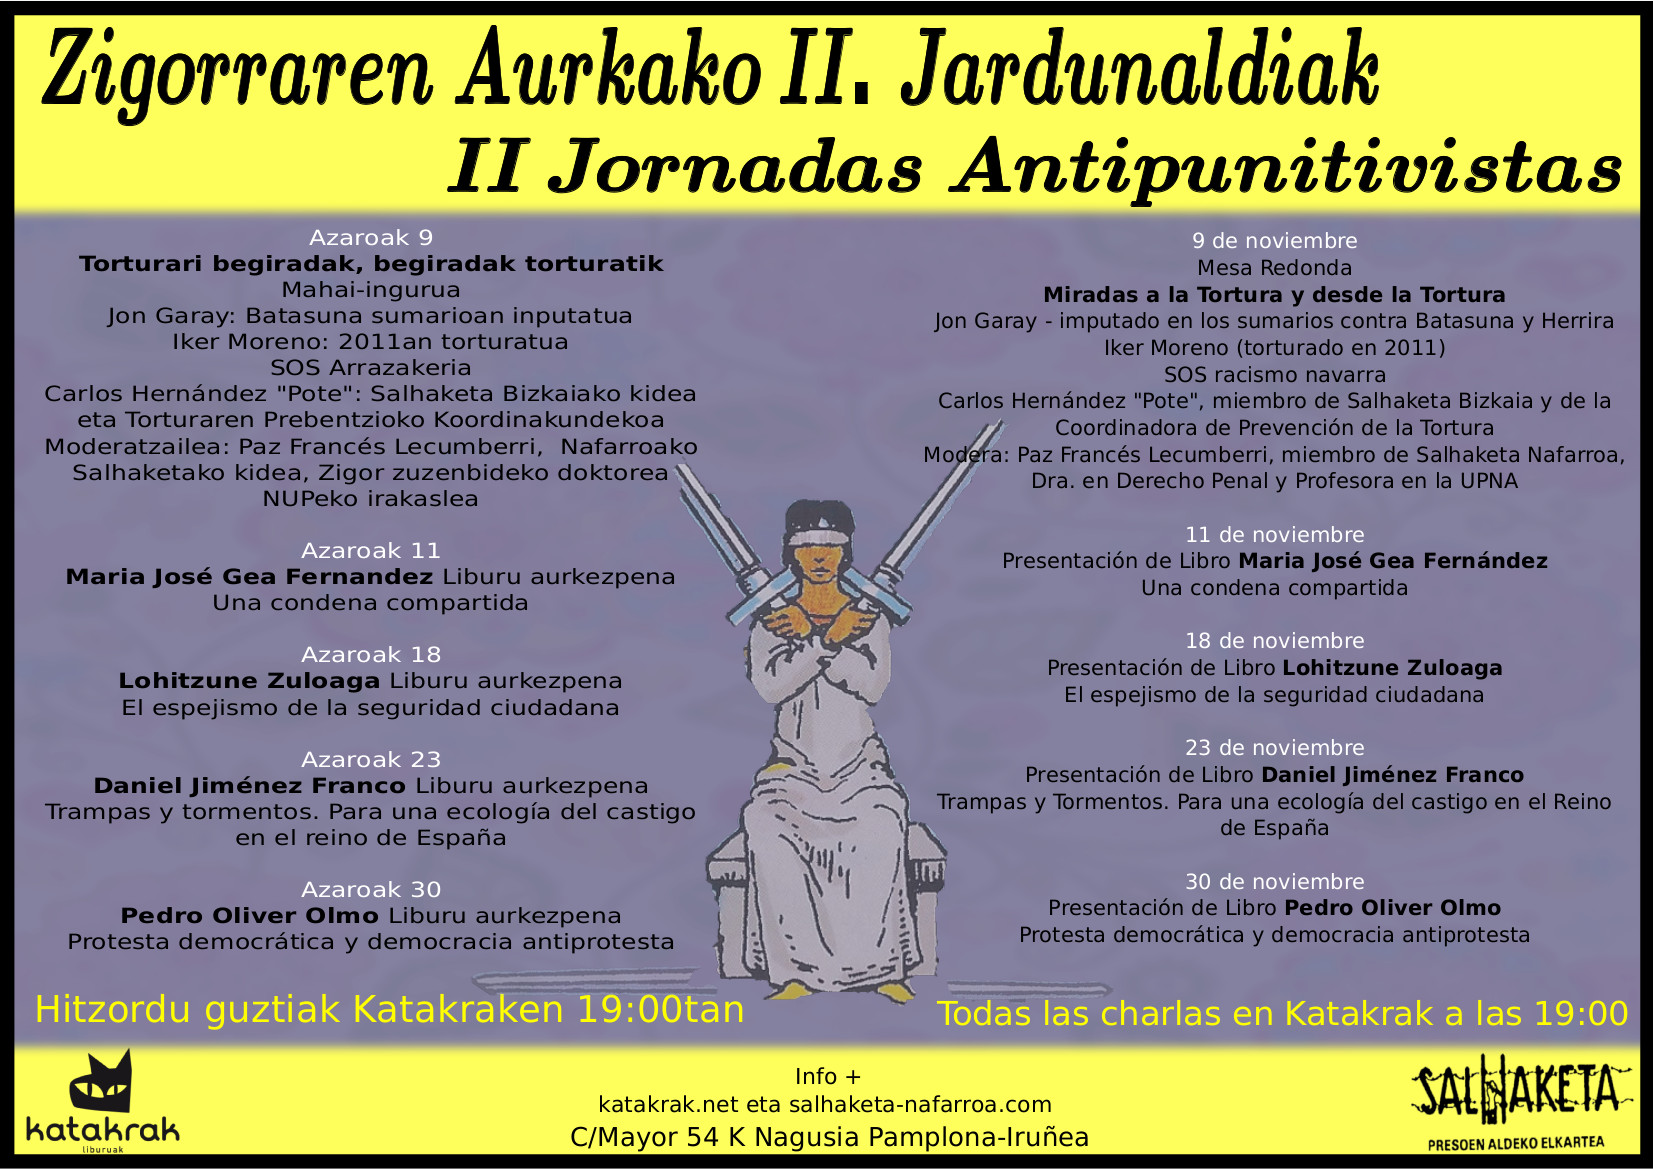 II JORNADAS ANTIPUNITIVISTAS